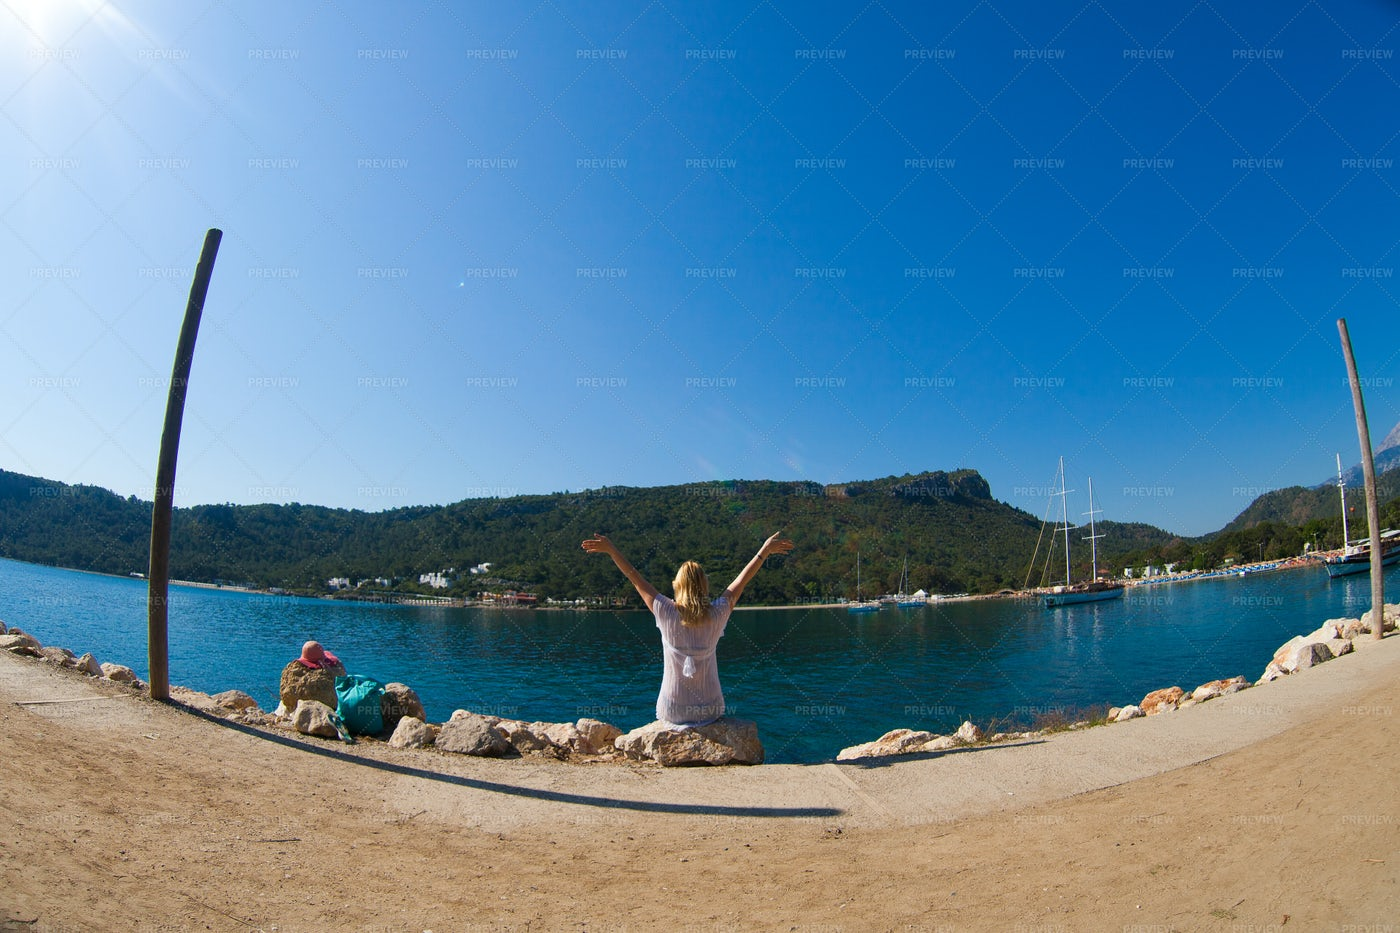 Celebrating Her Vacation: Stock Photos